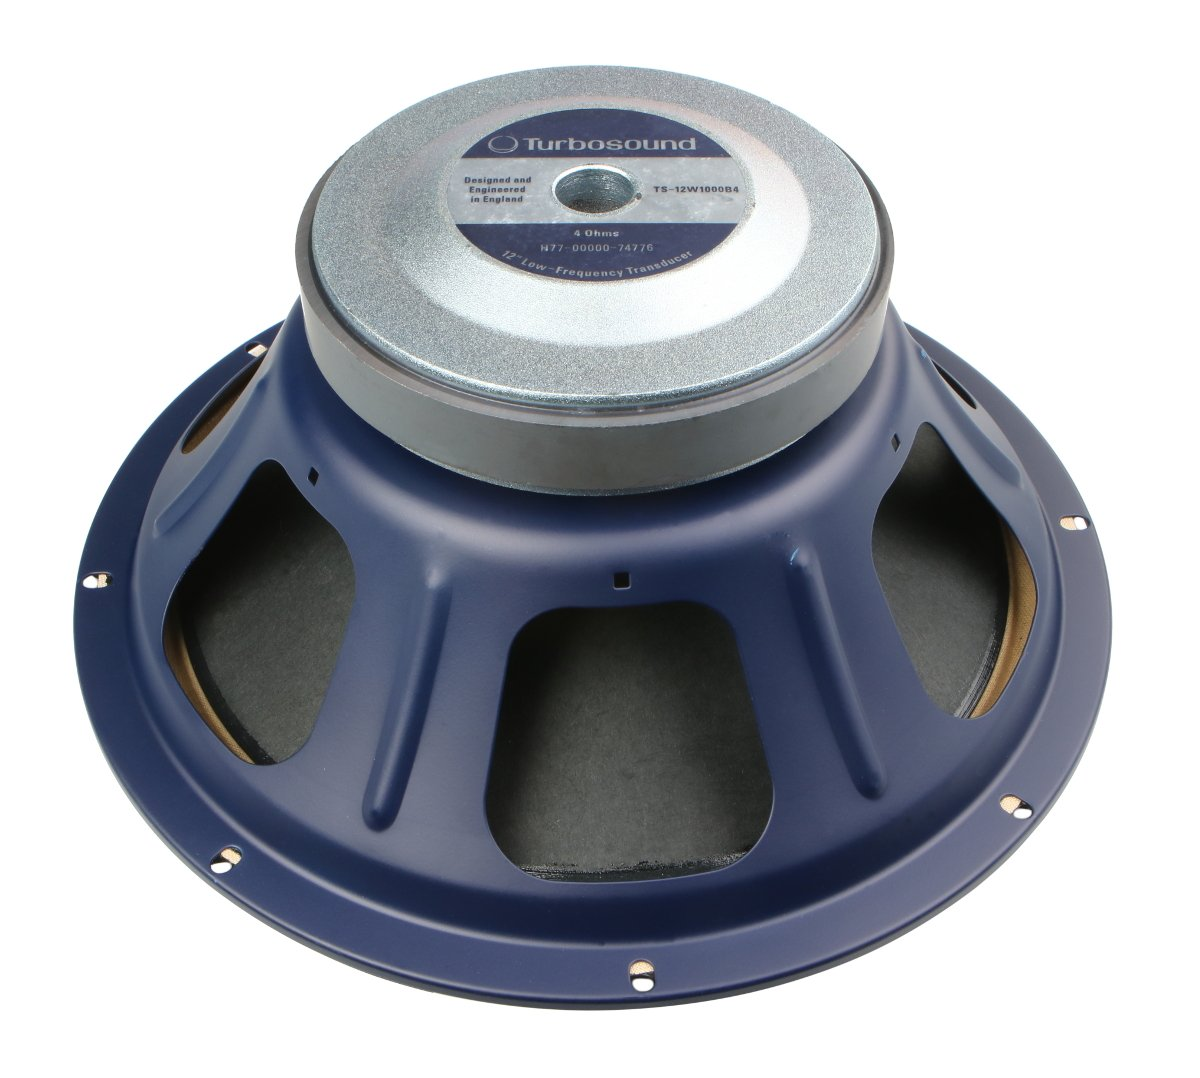 Turbosound X77-00000-74776 Woofer For IQ12 | Full Compass